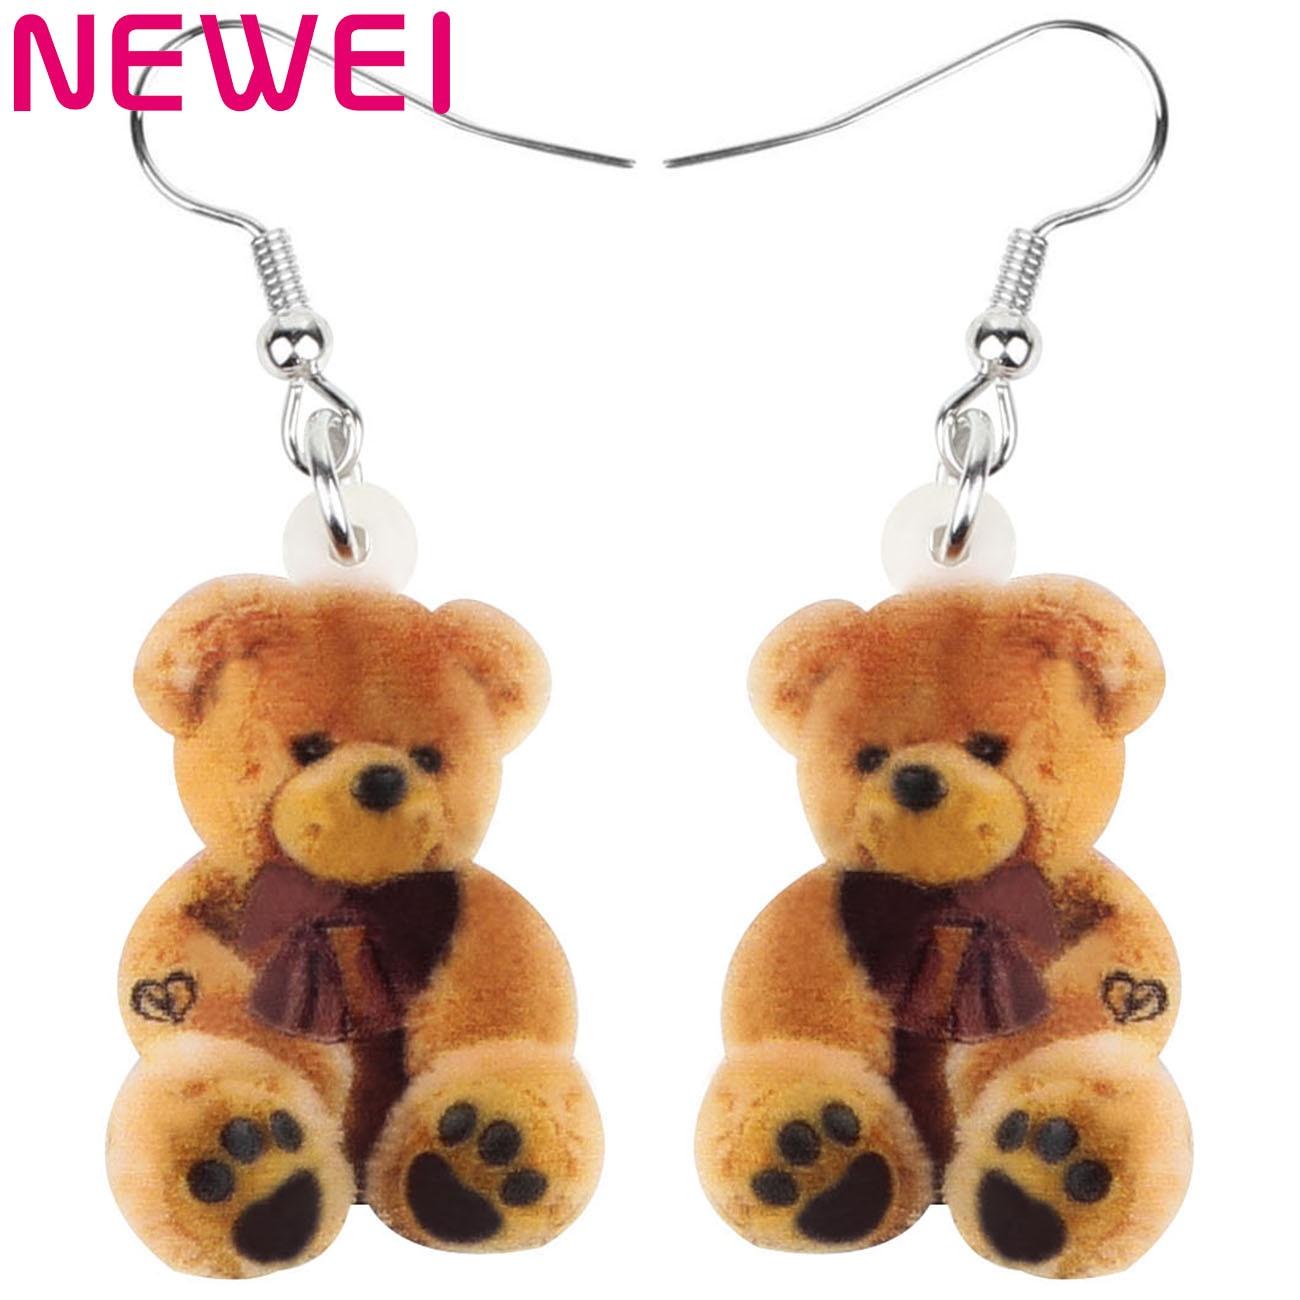 Newei Acrylic Sitting Brown Plush Teddy Bear Earrings Print Long Lovely Animal Dangle Drop Jewelry For Women Girl Kid Funny Gift